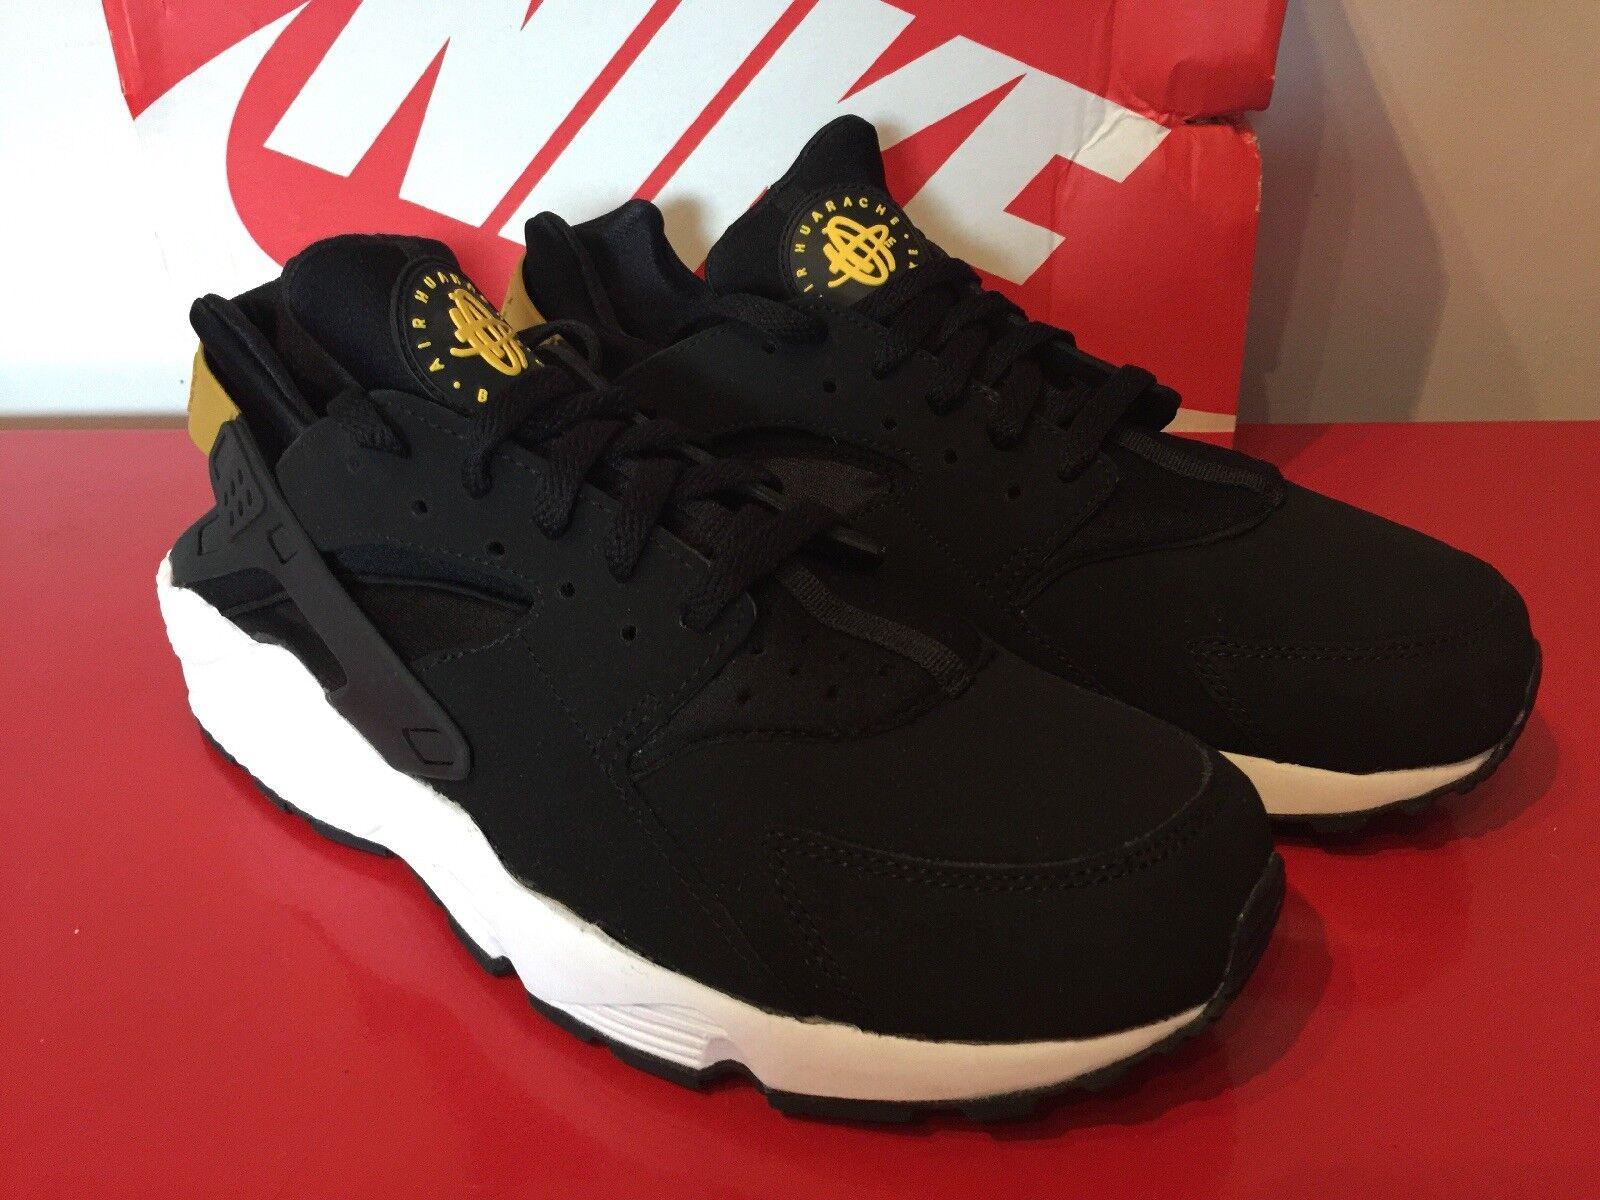 Nike Huarache OG-Nero Giallo Tour